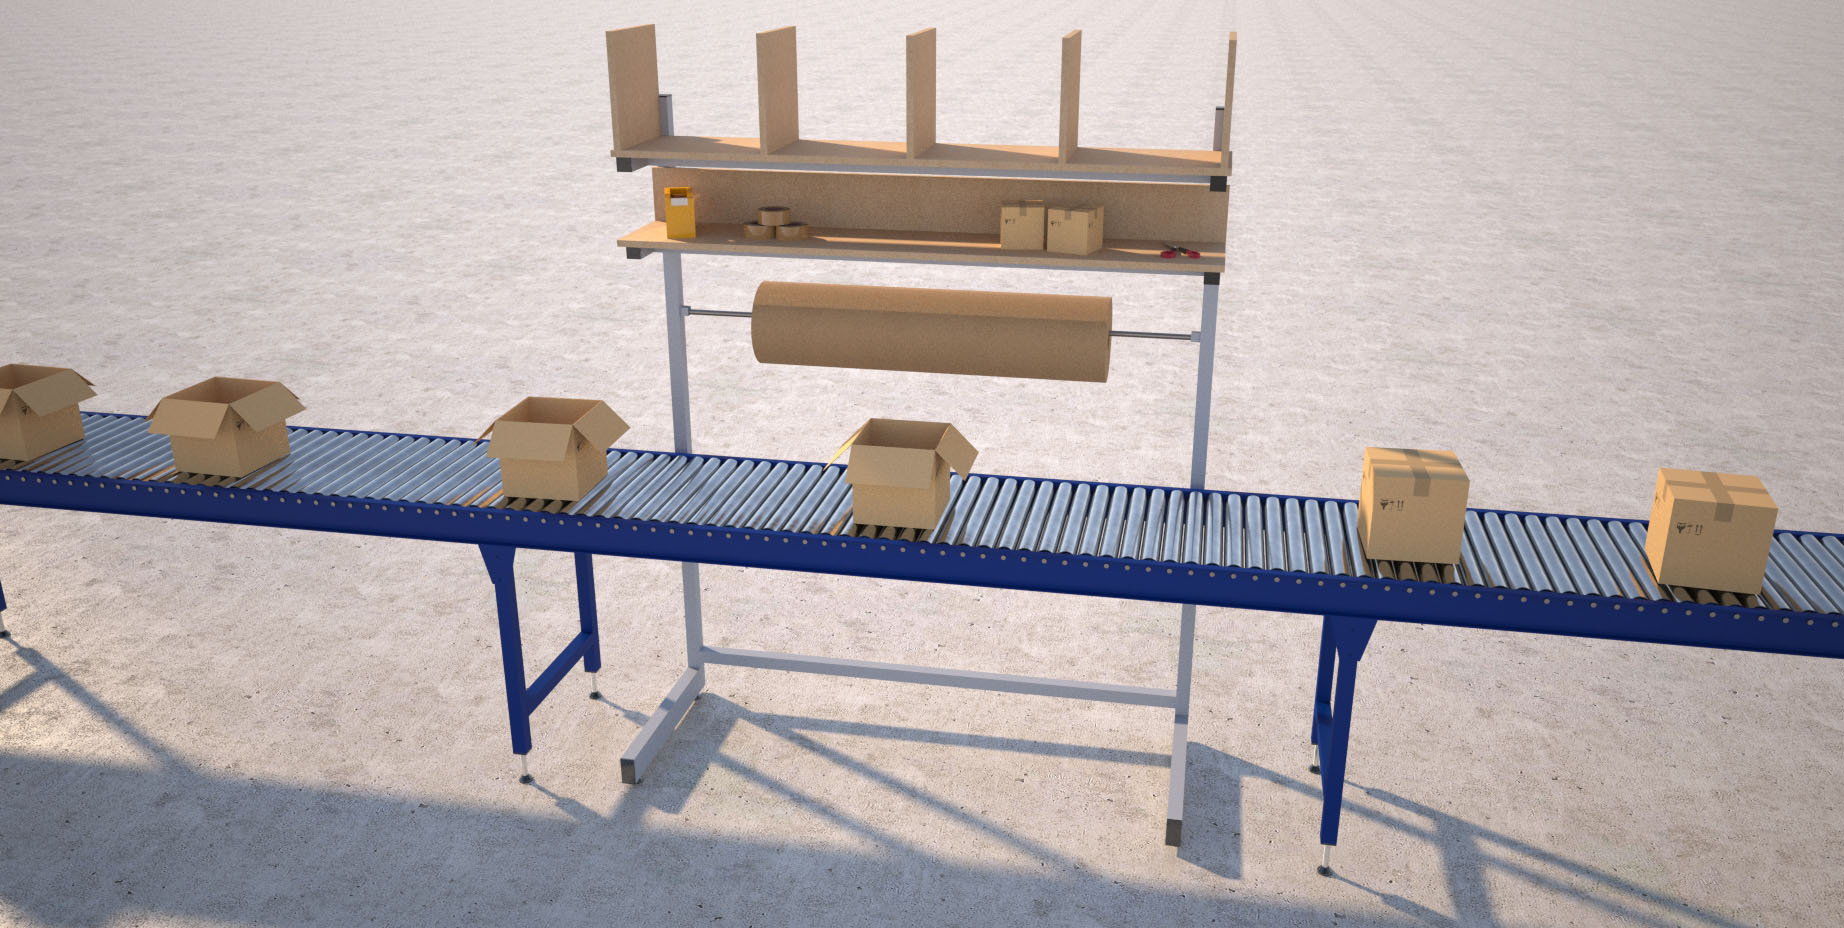 over conveyor packing line render